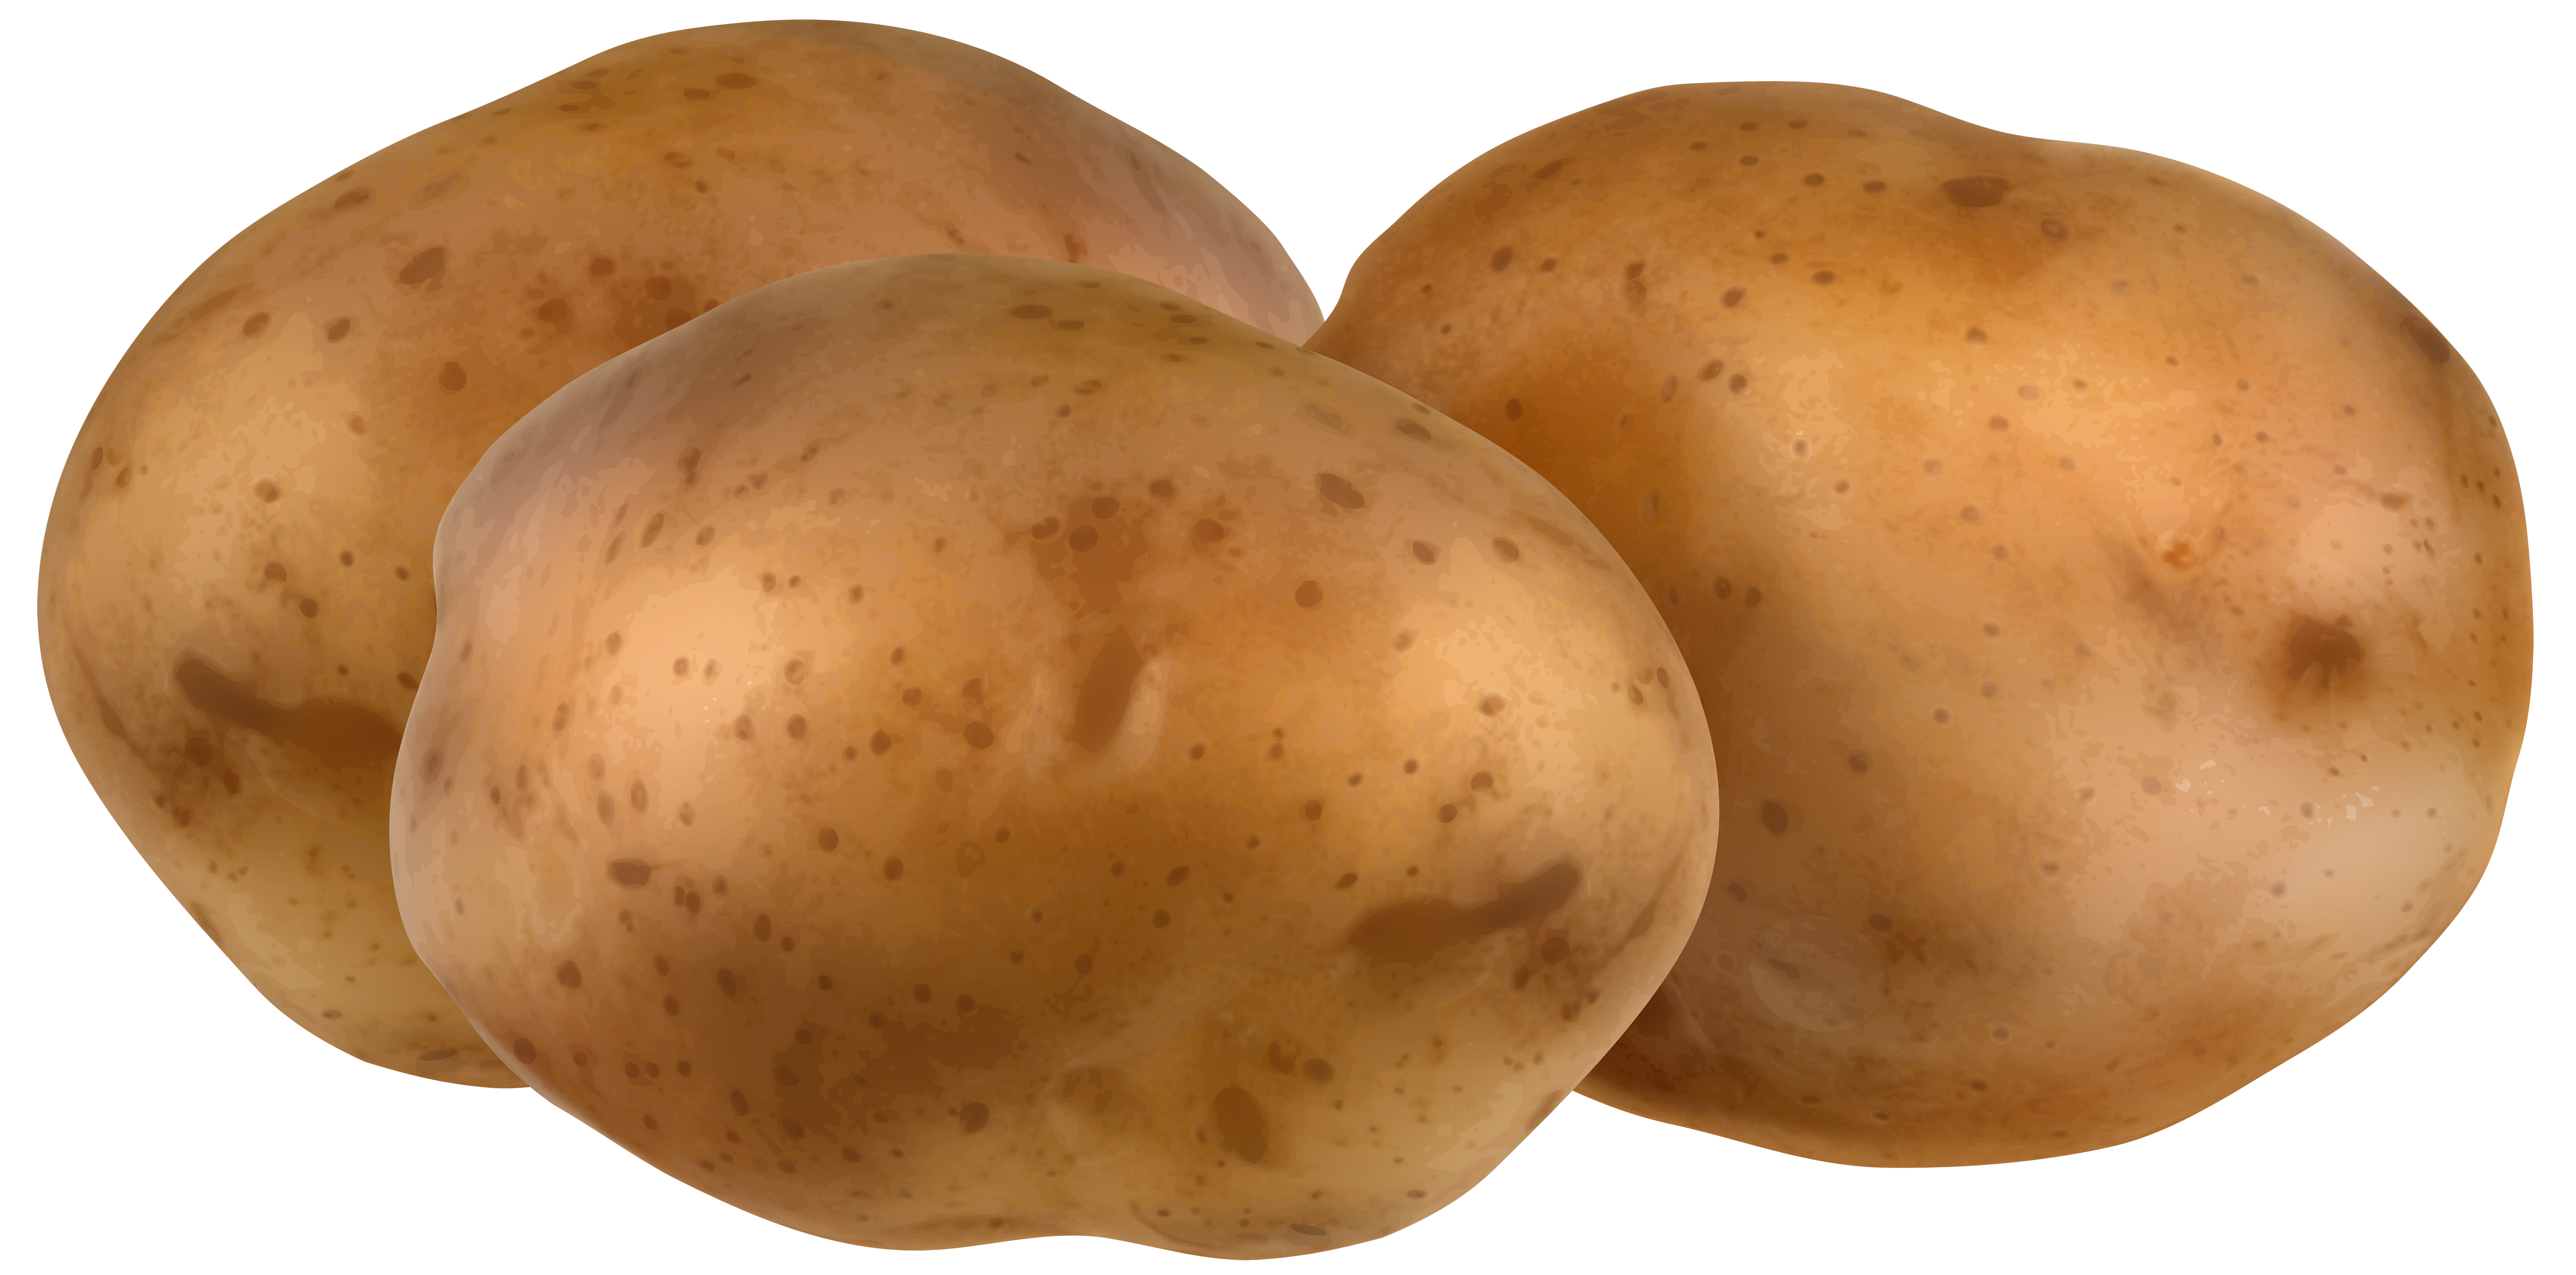 Potato clipart mash potato. Mashed french fries baked